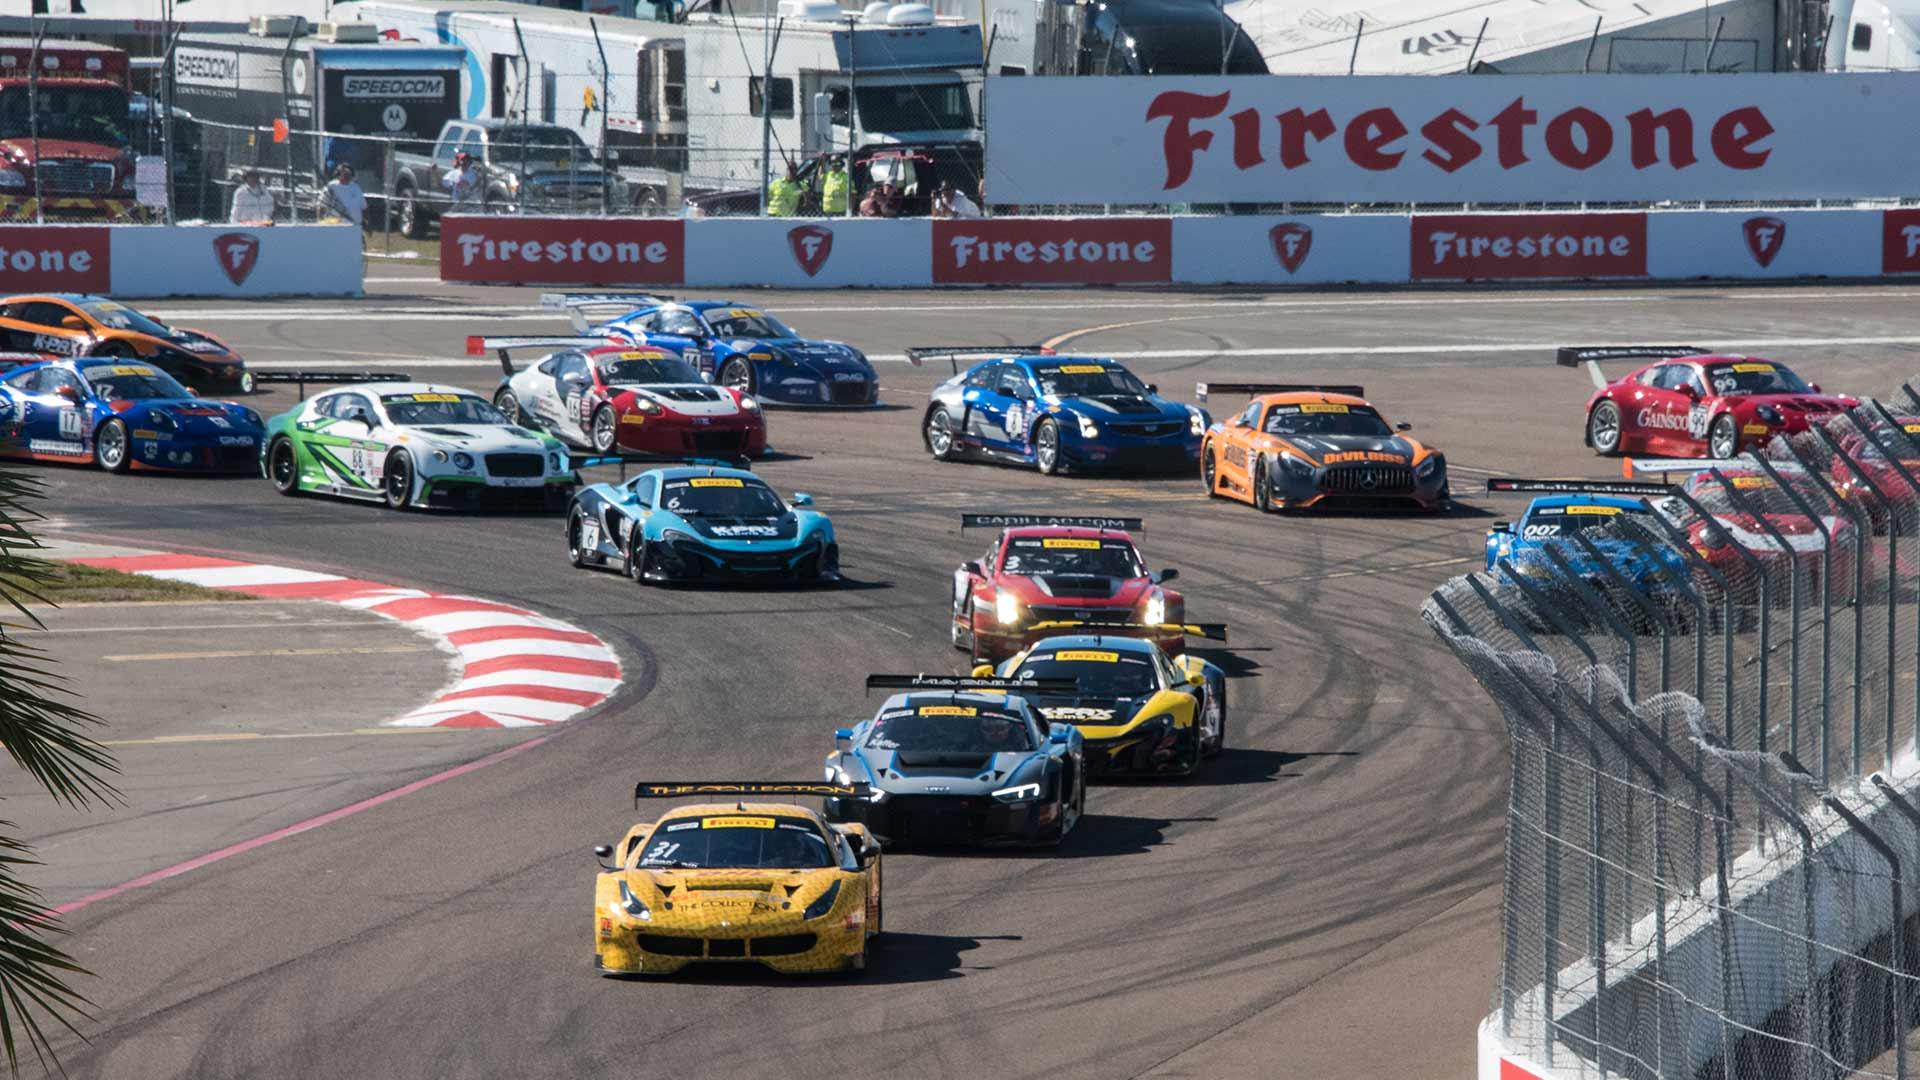 Grand Prix Racing >> Firestone Grand Prix Of St Petersburg Schedule